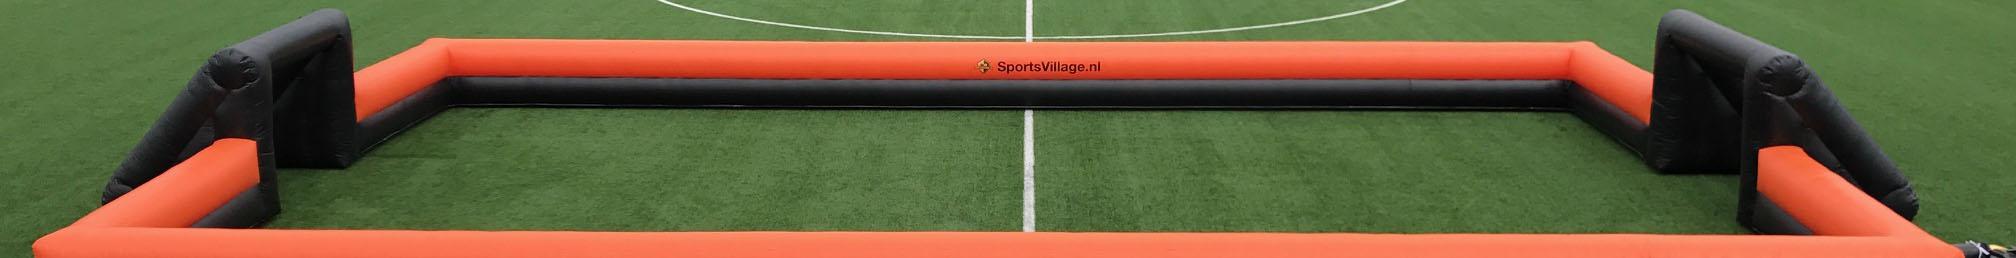 sportvillage-2